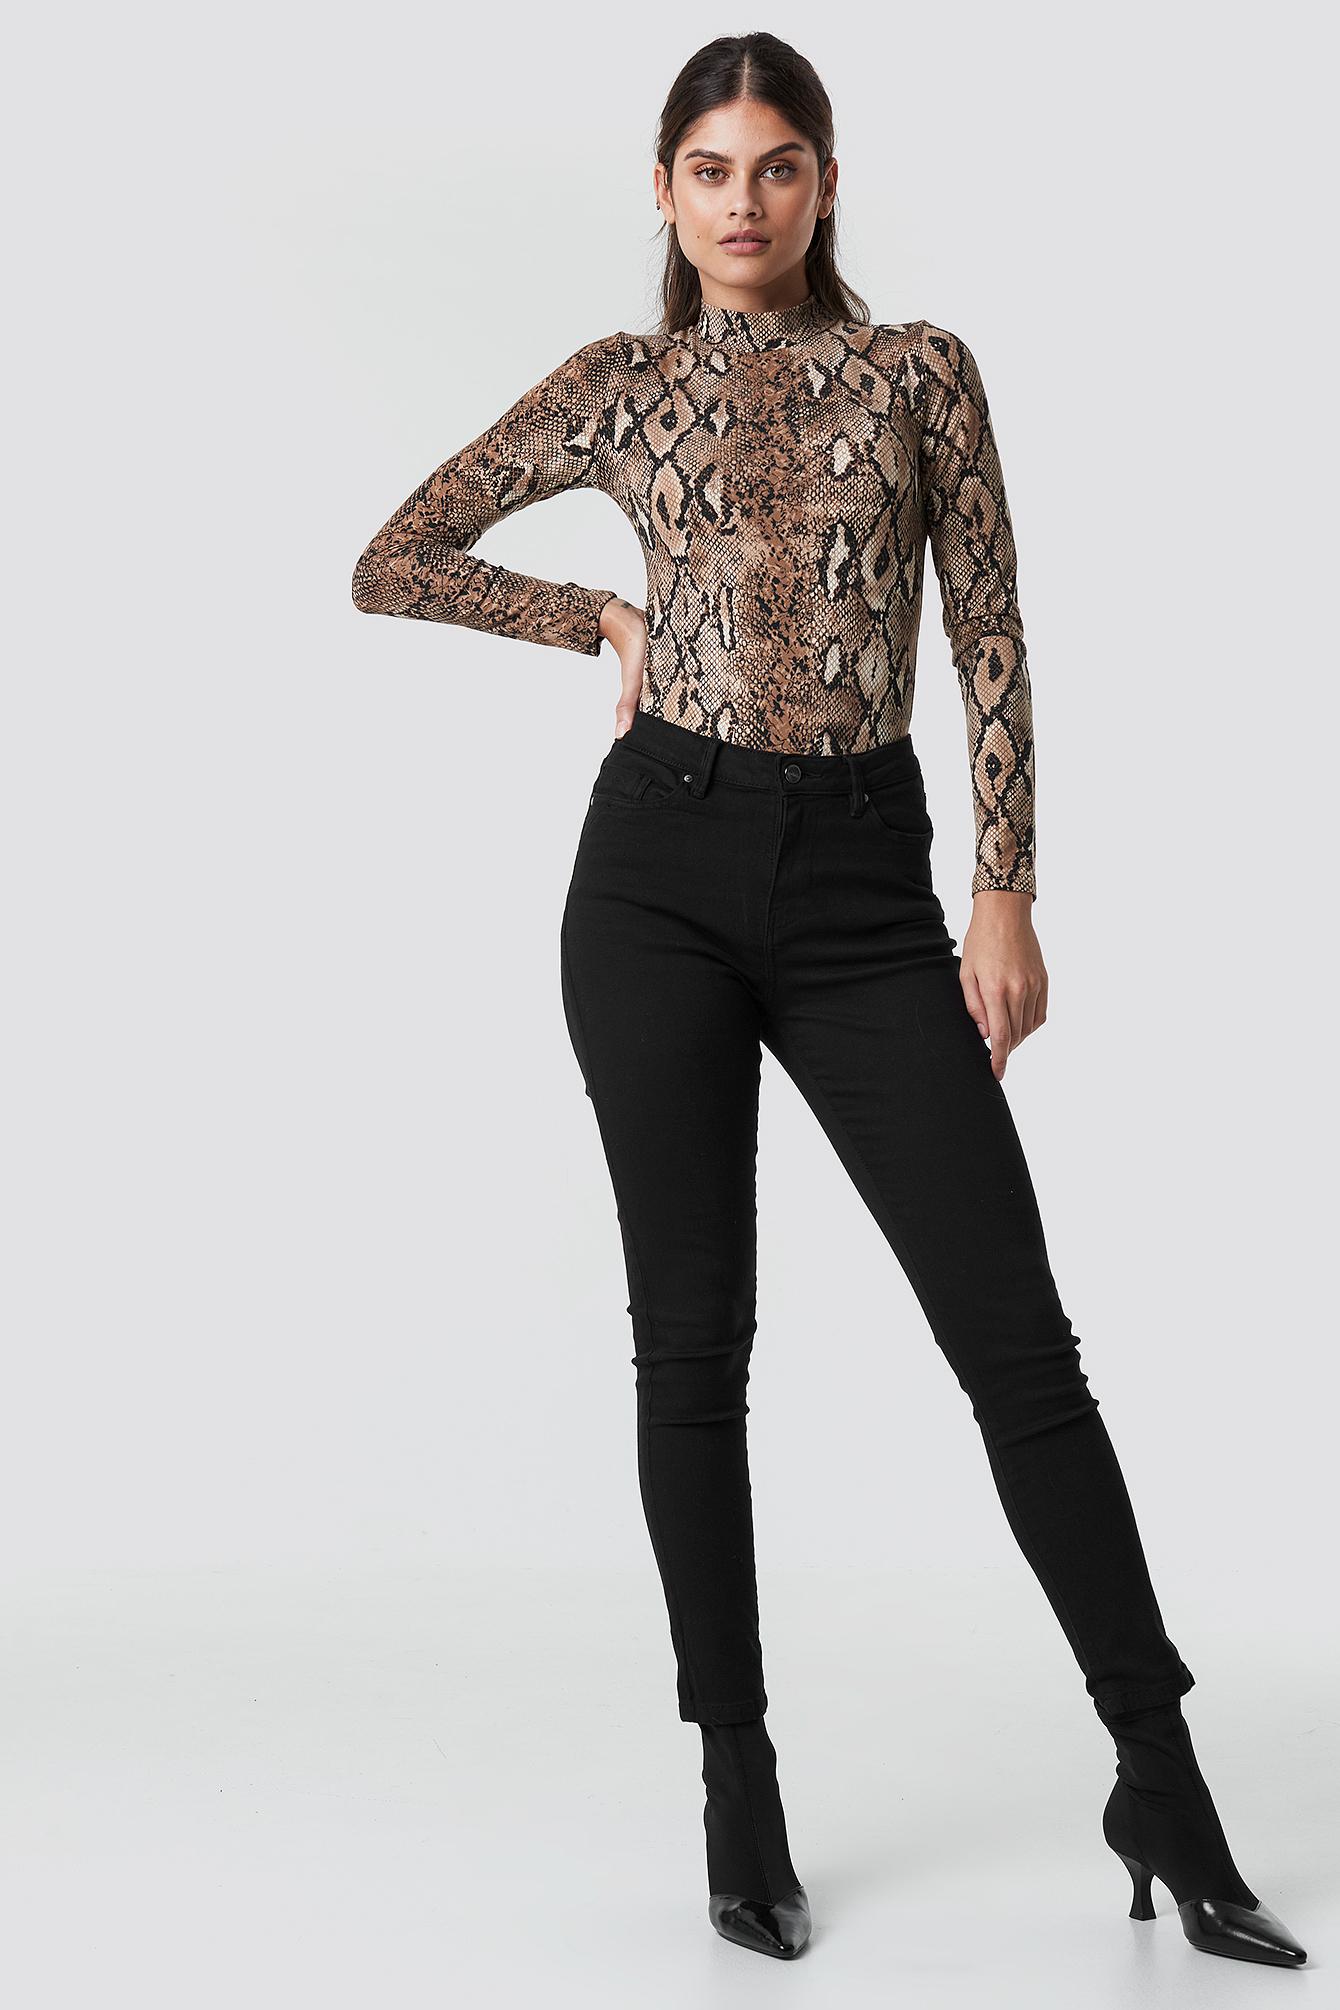 TOP SECRET Skinny Ts Black Jeans - Black